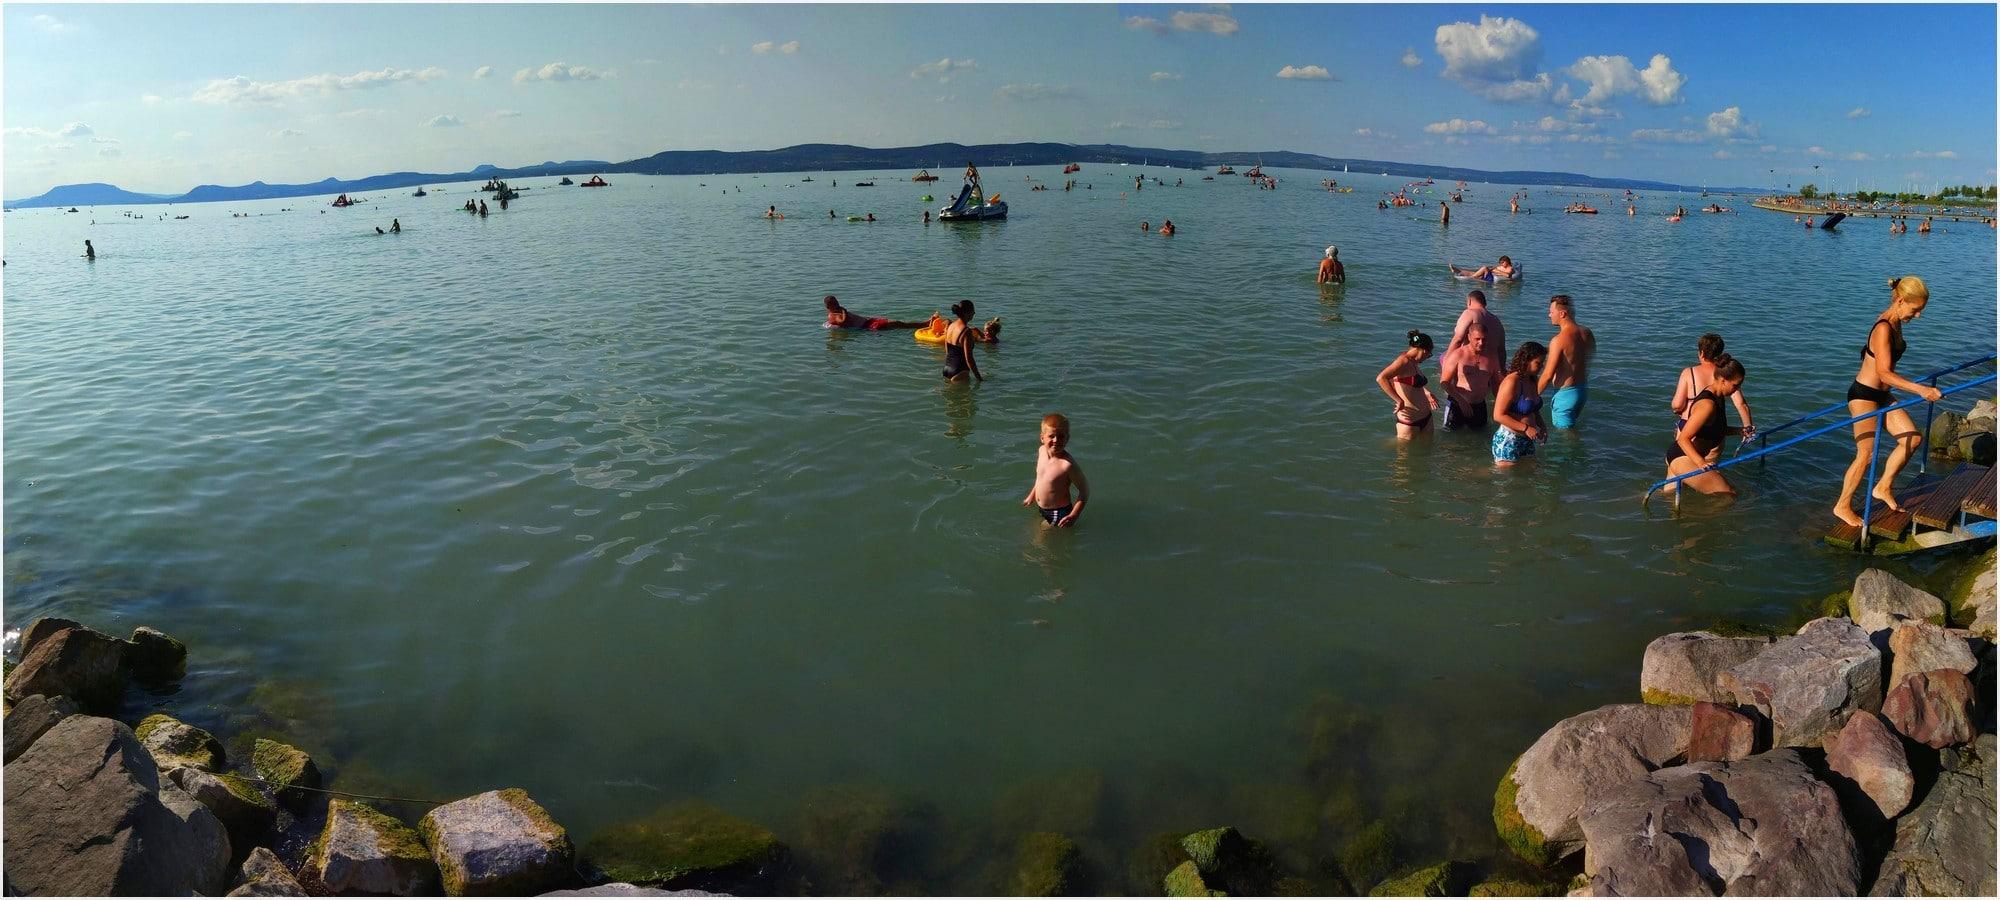 The fantastic Lake Balaton